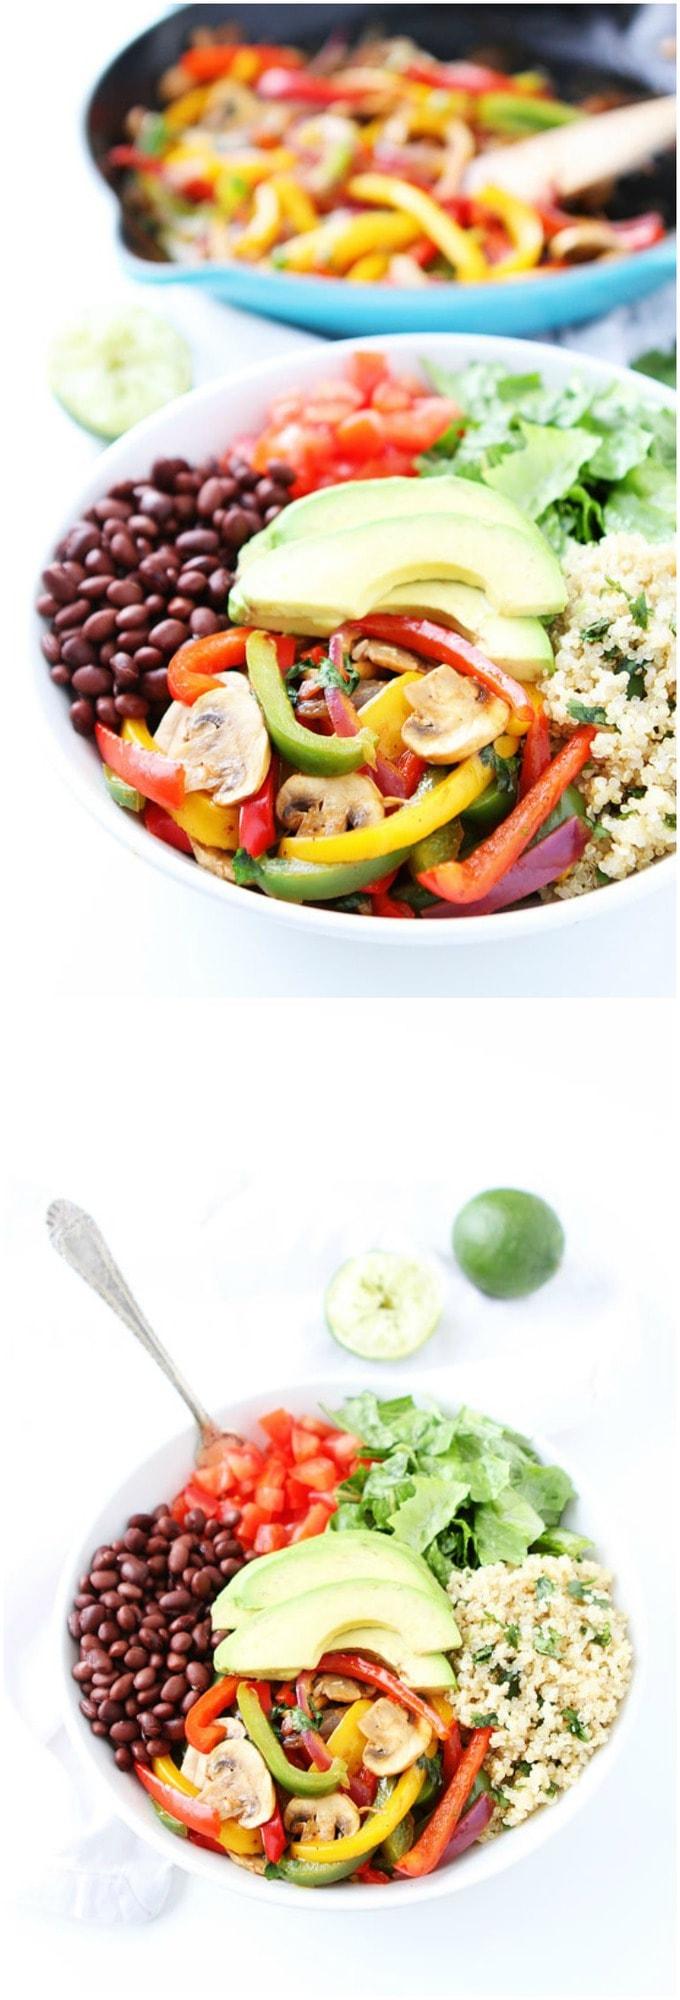 Fajita Quinoa Bowls Recipe on twopeasandtheirpod.com If you like fajitas, you will love these healthy bowls! Fun to make and eat!